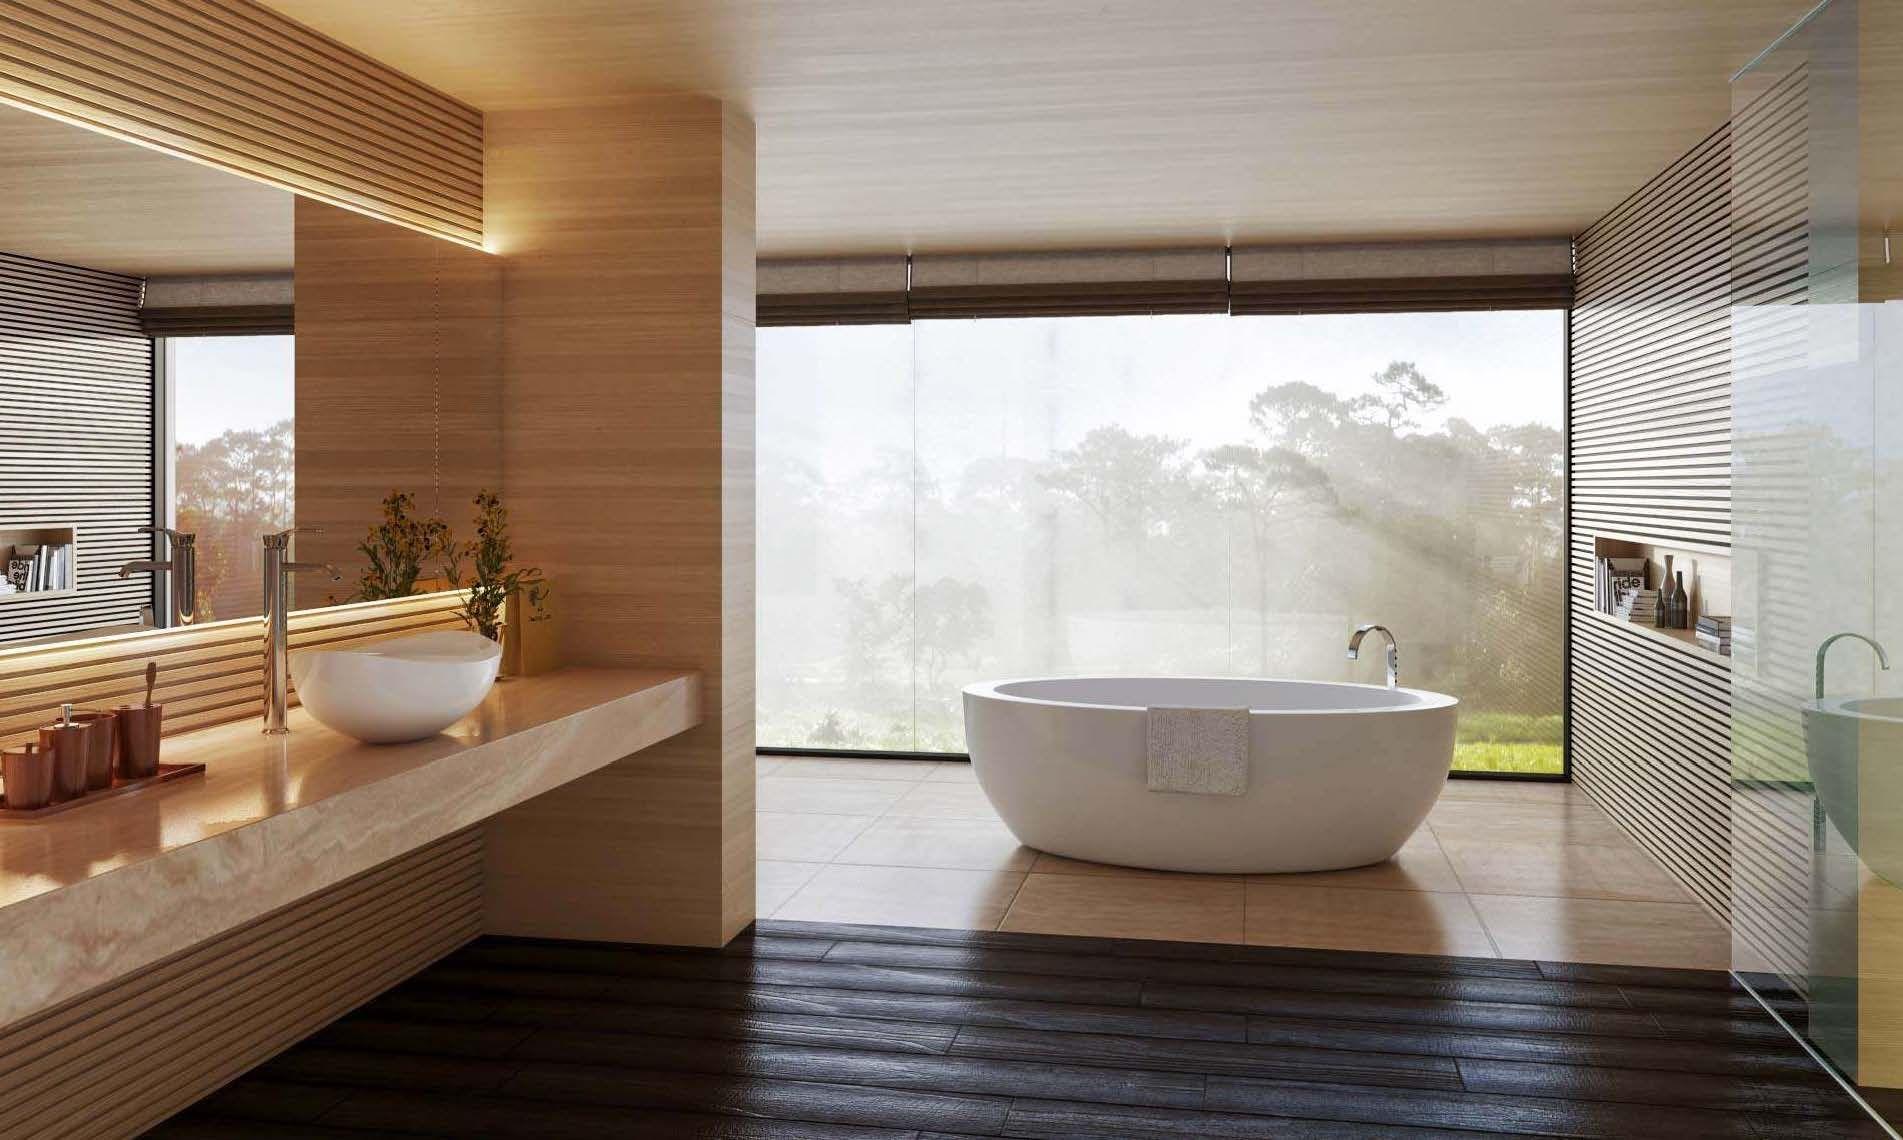 bathroom-design-pdf-inspirational-beautiful-bathroom-designs-best